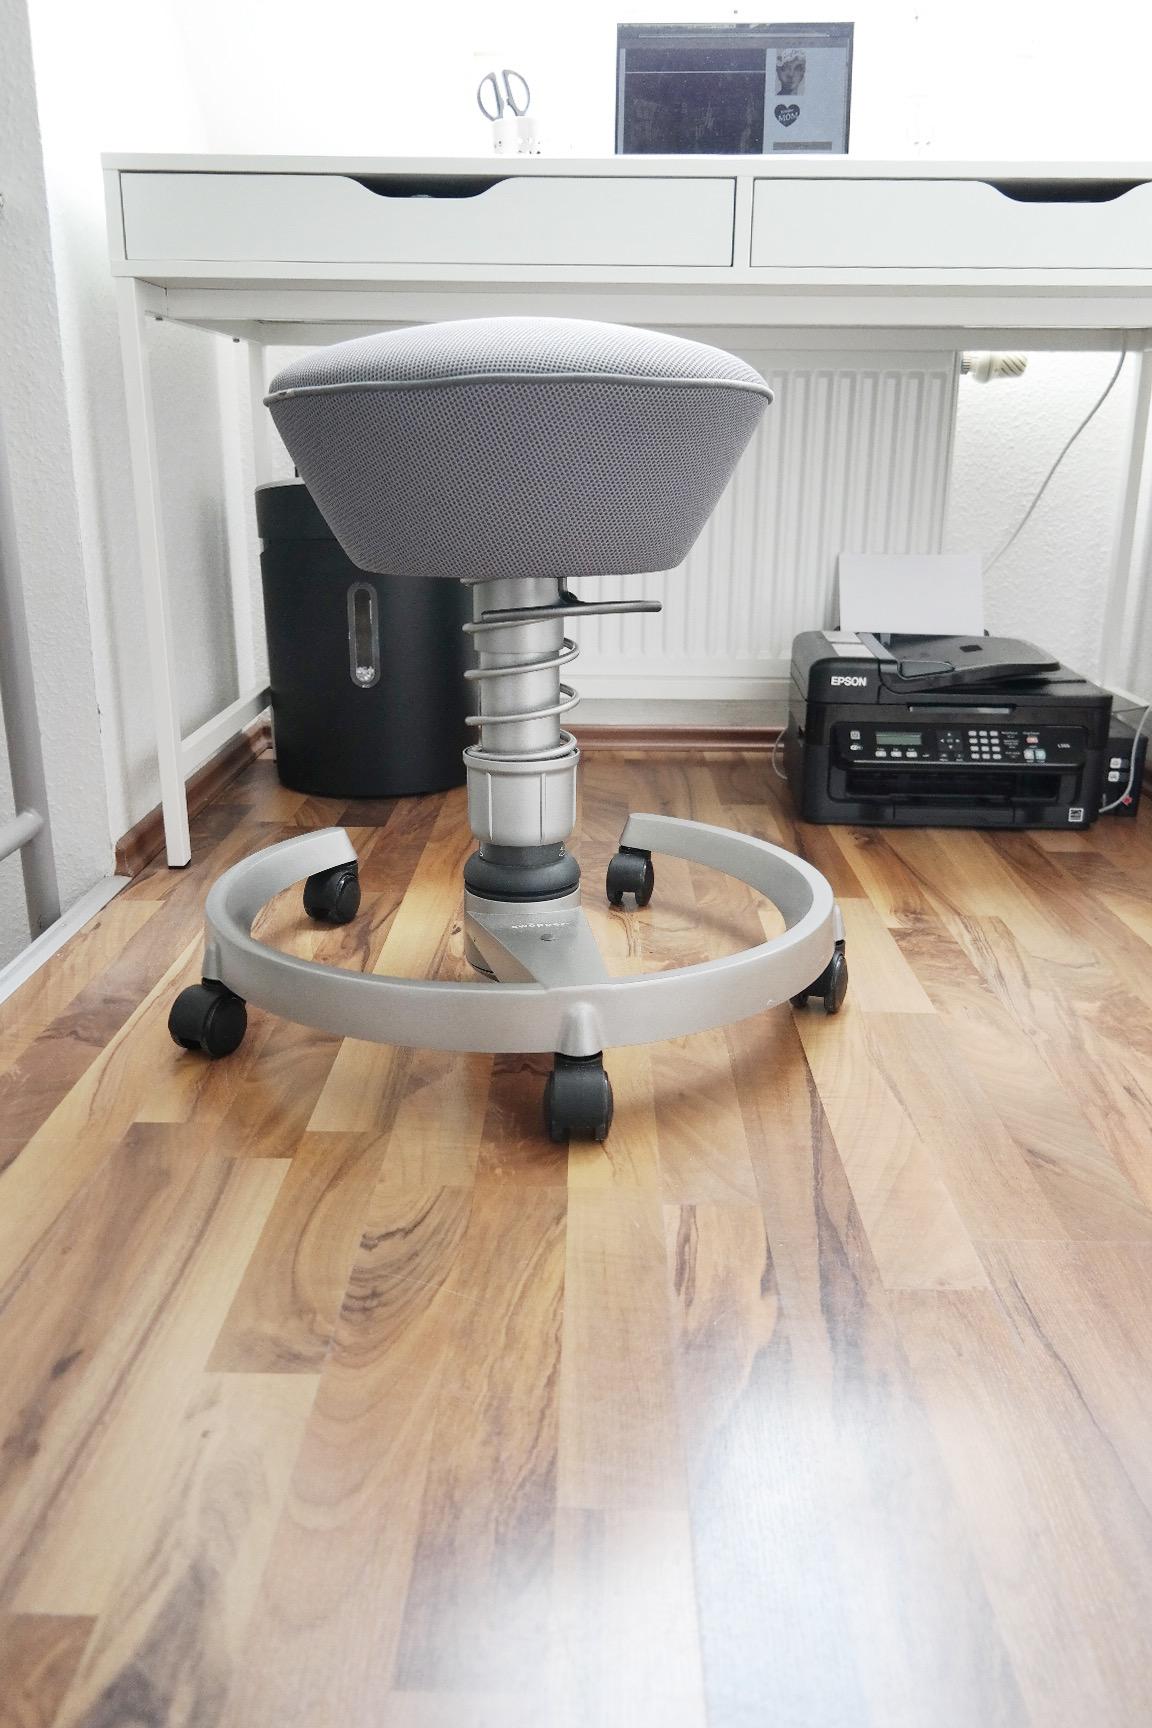 missbb swoppt jetzt mit dem schreibtischstuhl missbonn e bonn e. Black Bedroom Furniture Sets. Home Design Ideas